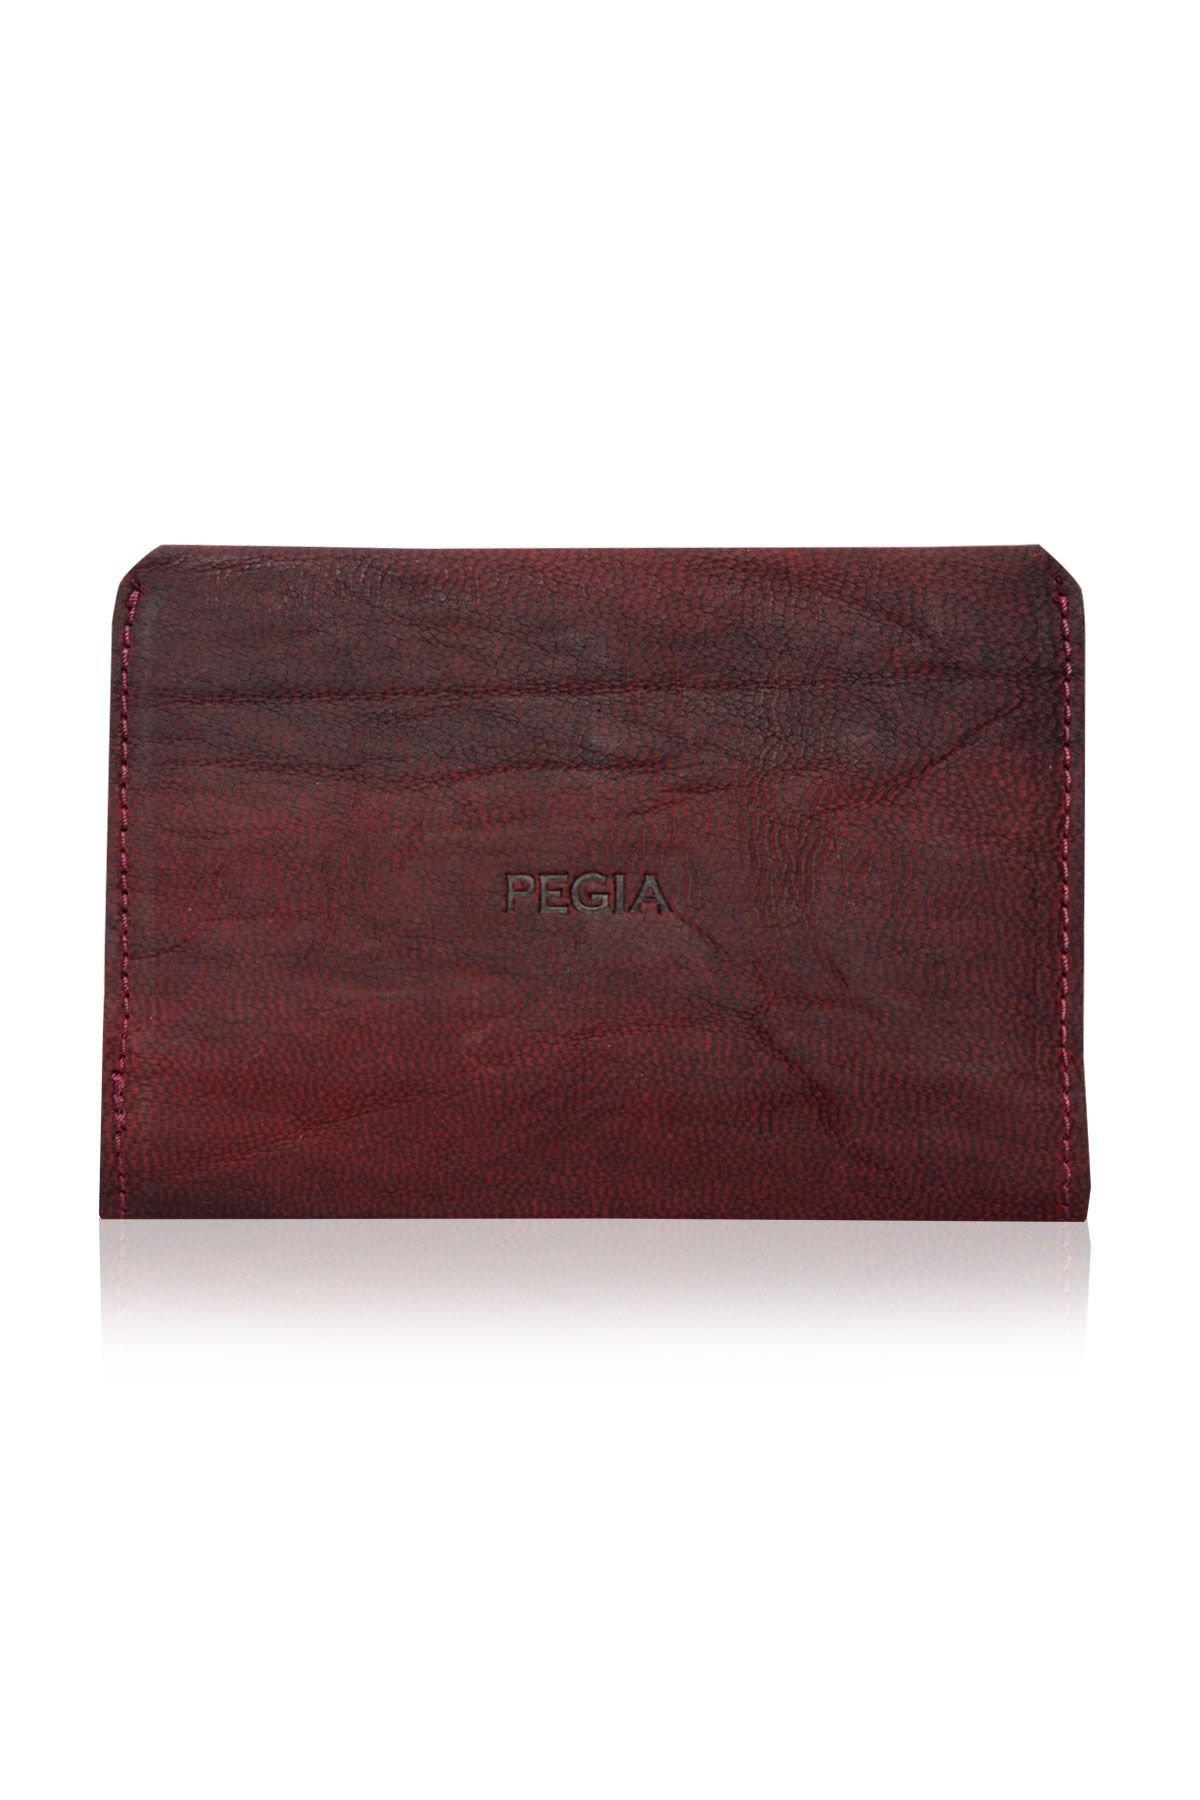 Pegia Genuine Leather Vintage Wallet 19CZ305 Claret red